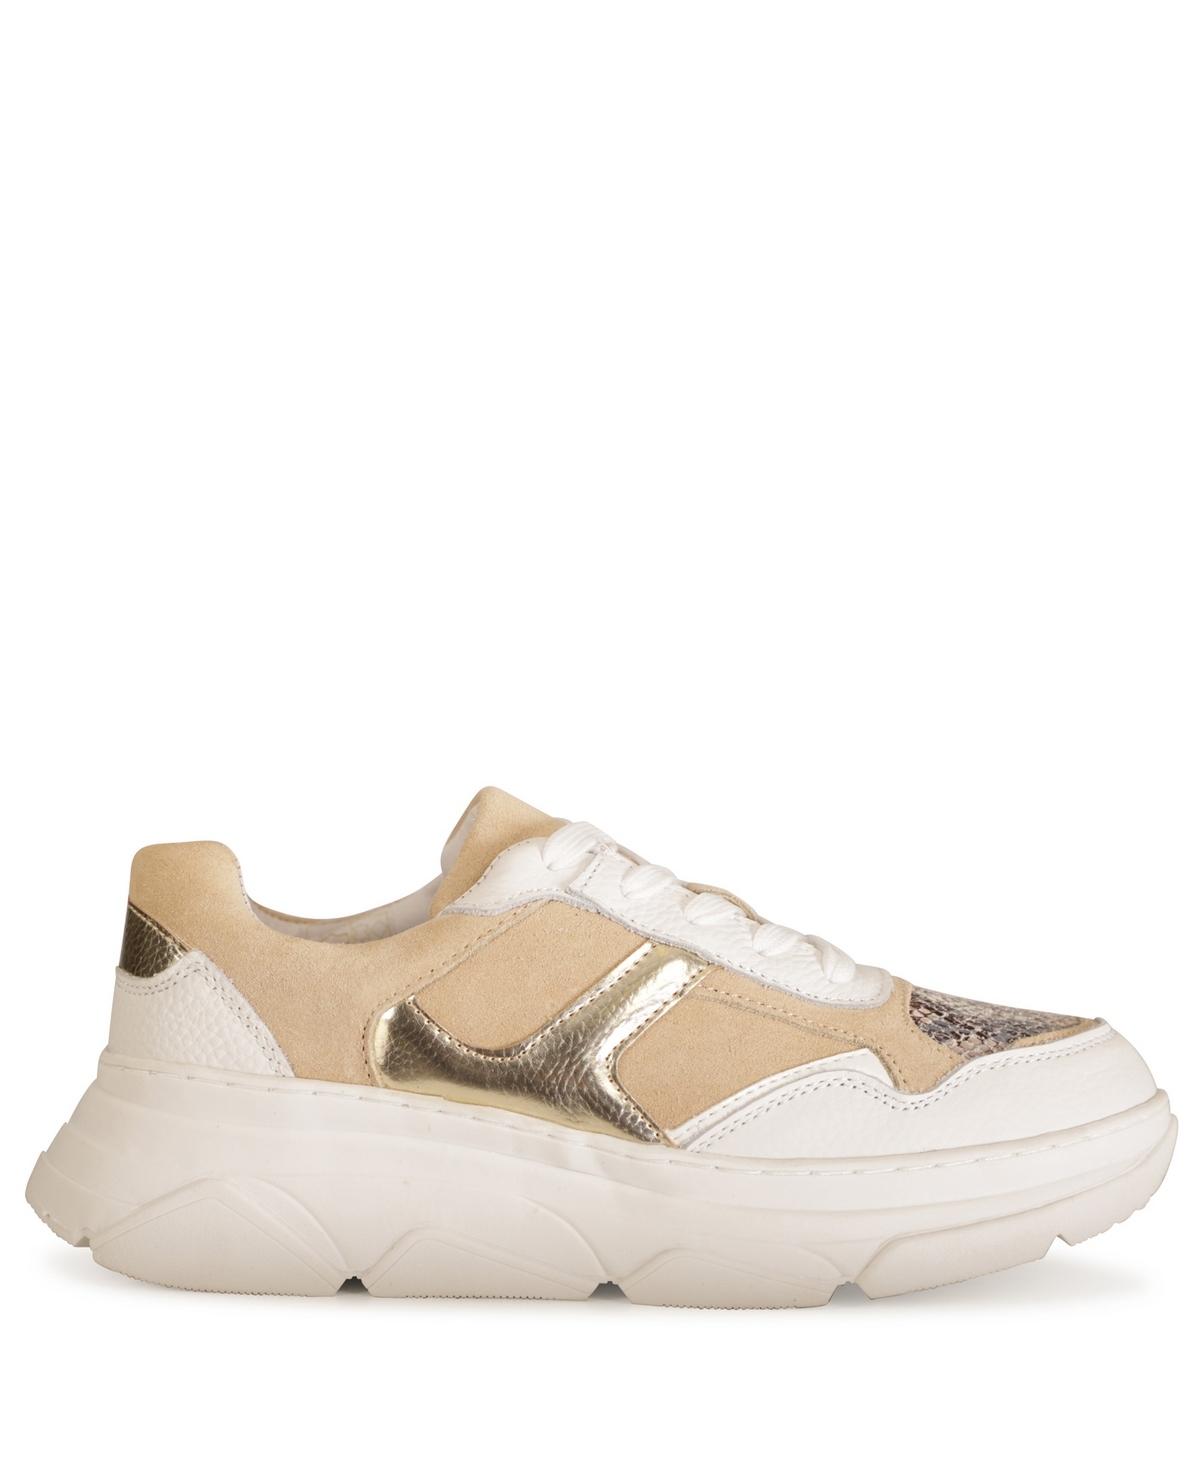 Shoecolate Sneaker Beige 8.10.06.072